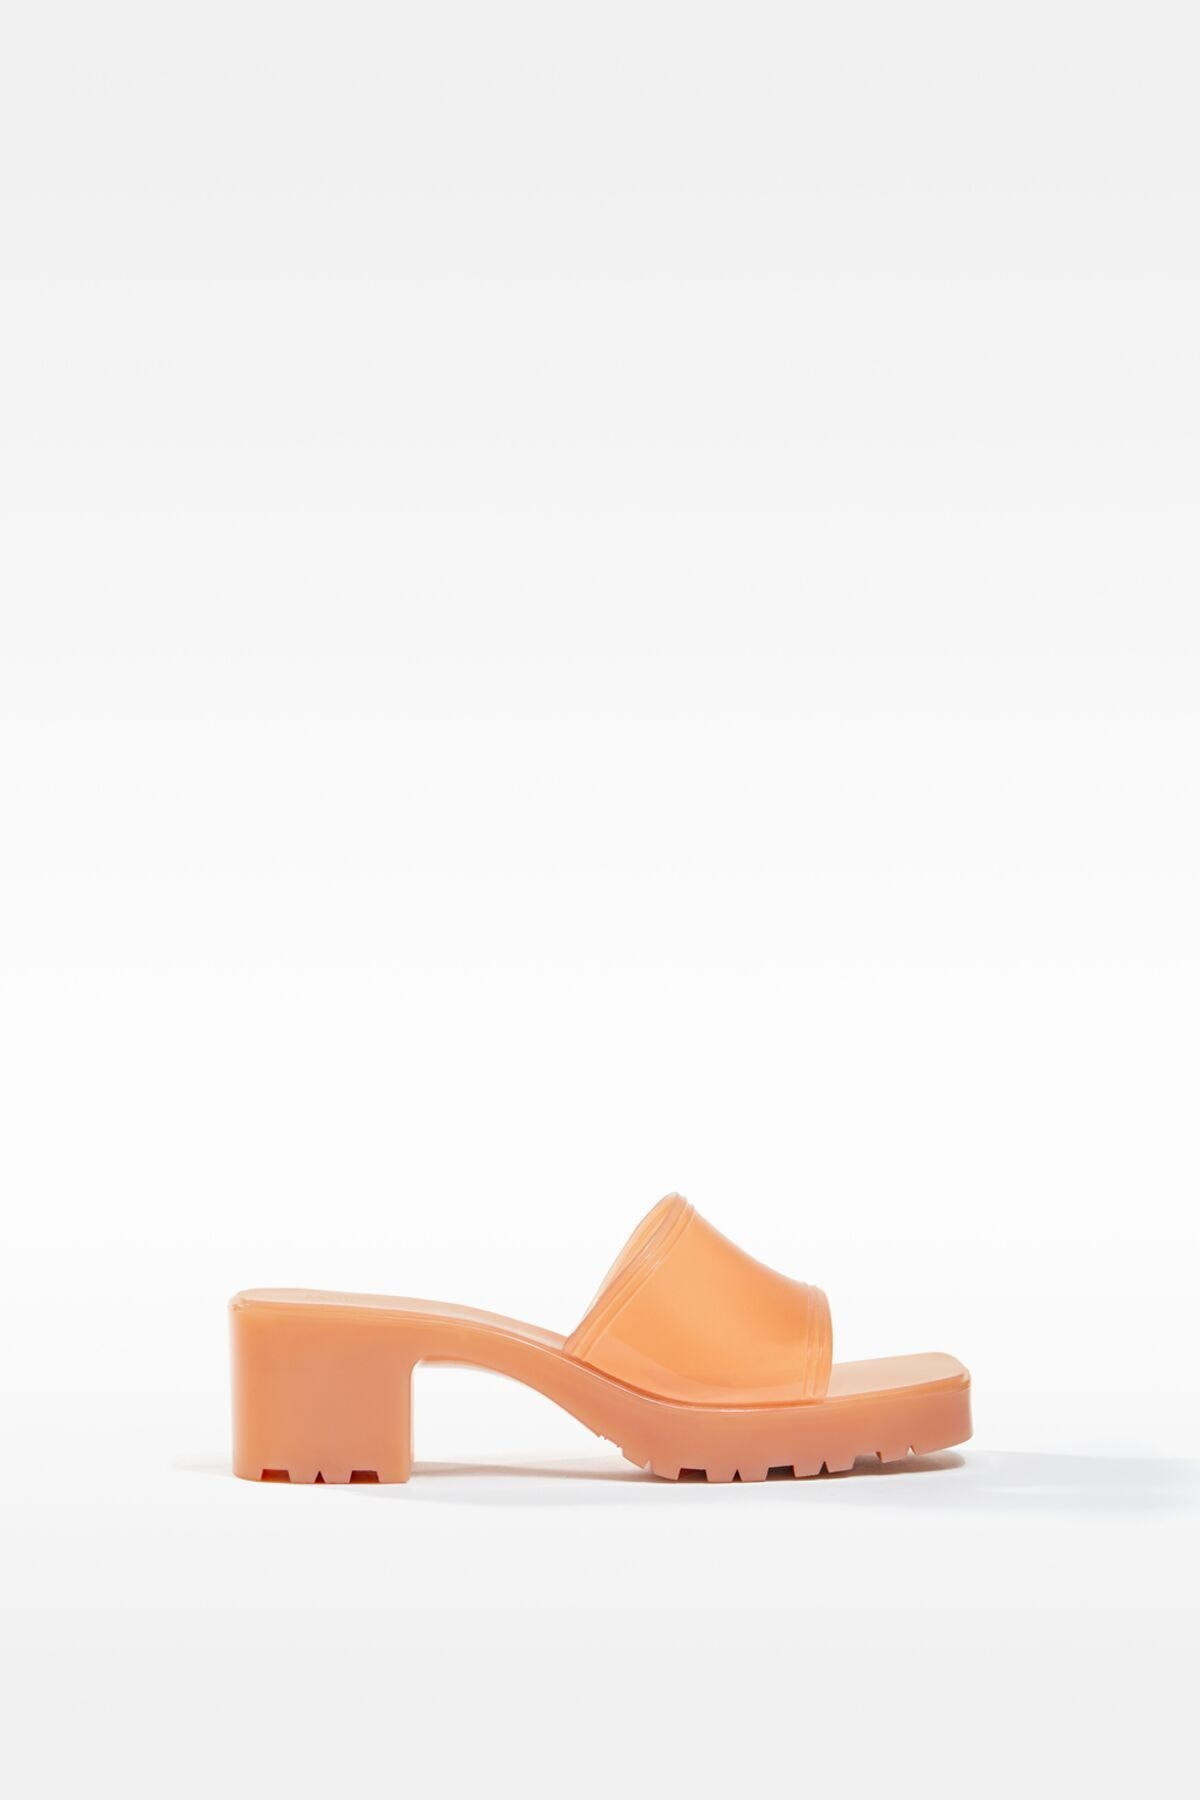 Bershka Kadın Ekru Parlak Topuklu Sandalet 11722760 0